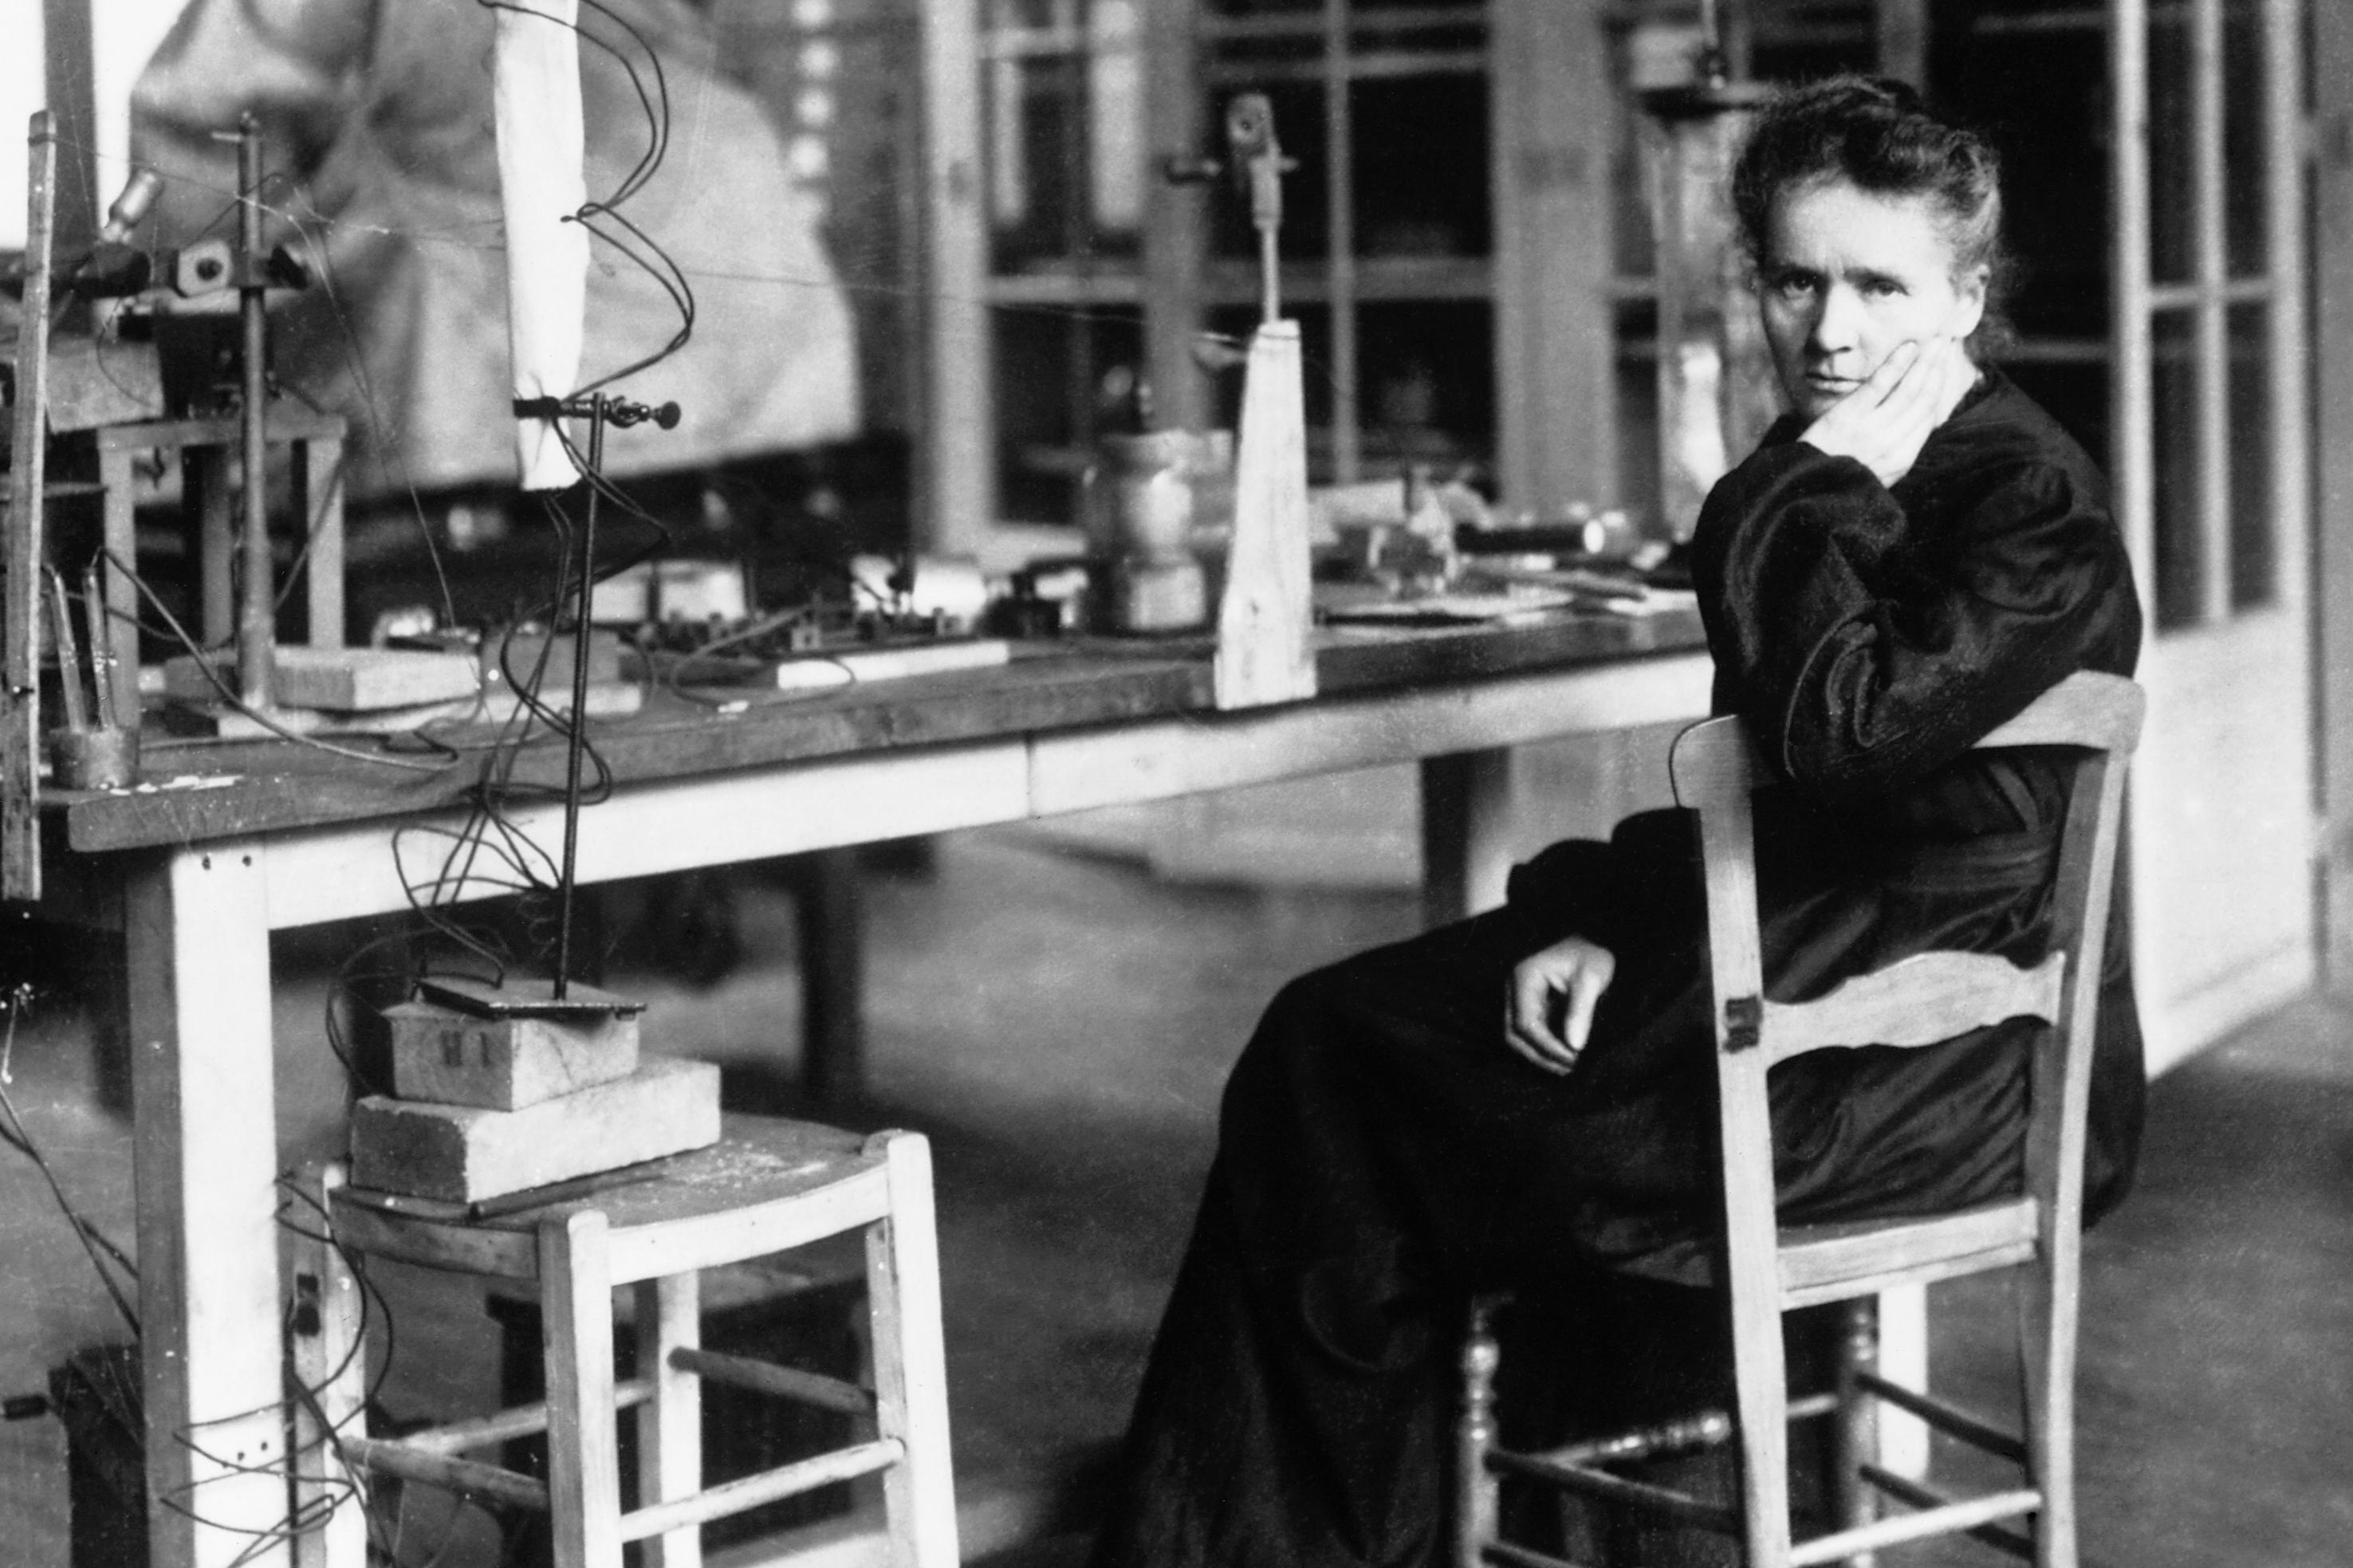 Marie Curie laboratorio